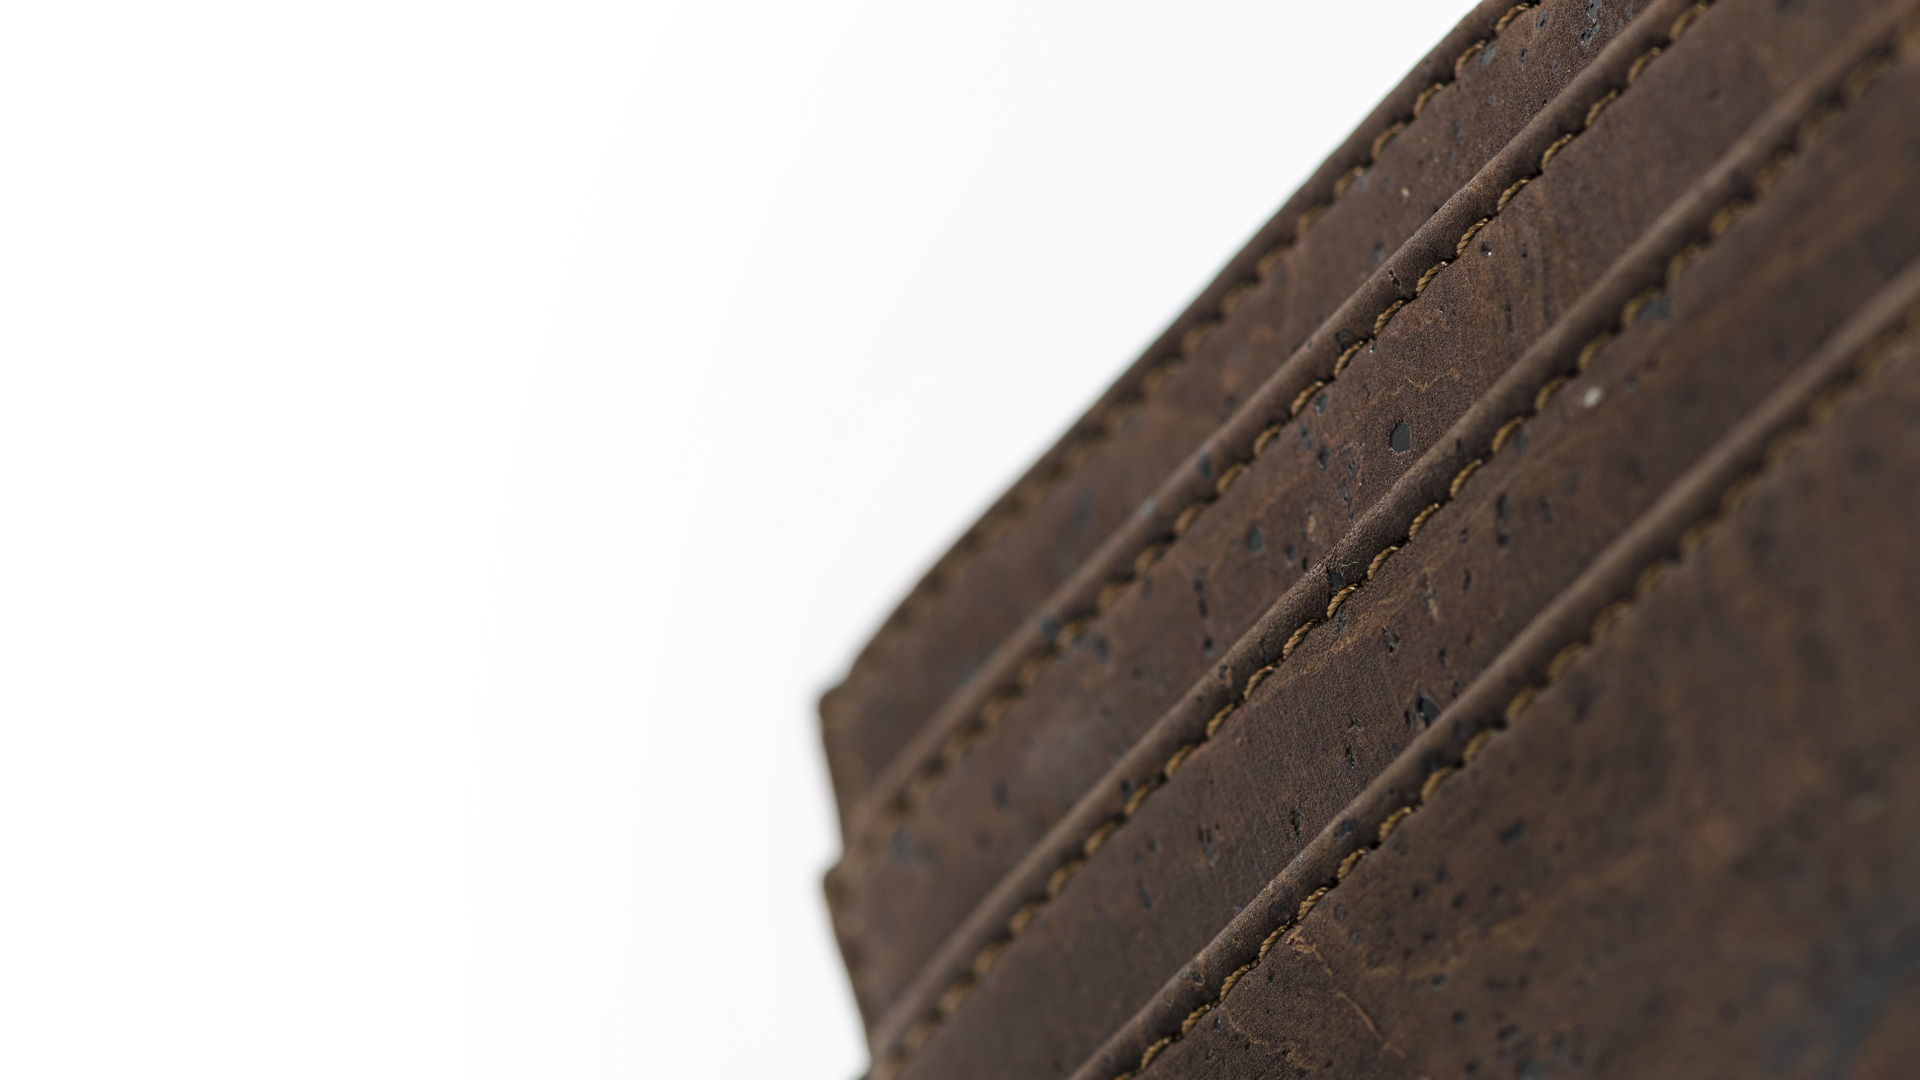 Korkportemonnaie, Kork Portemonnaie Card Holder, Brown, editorial